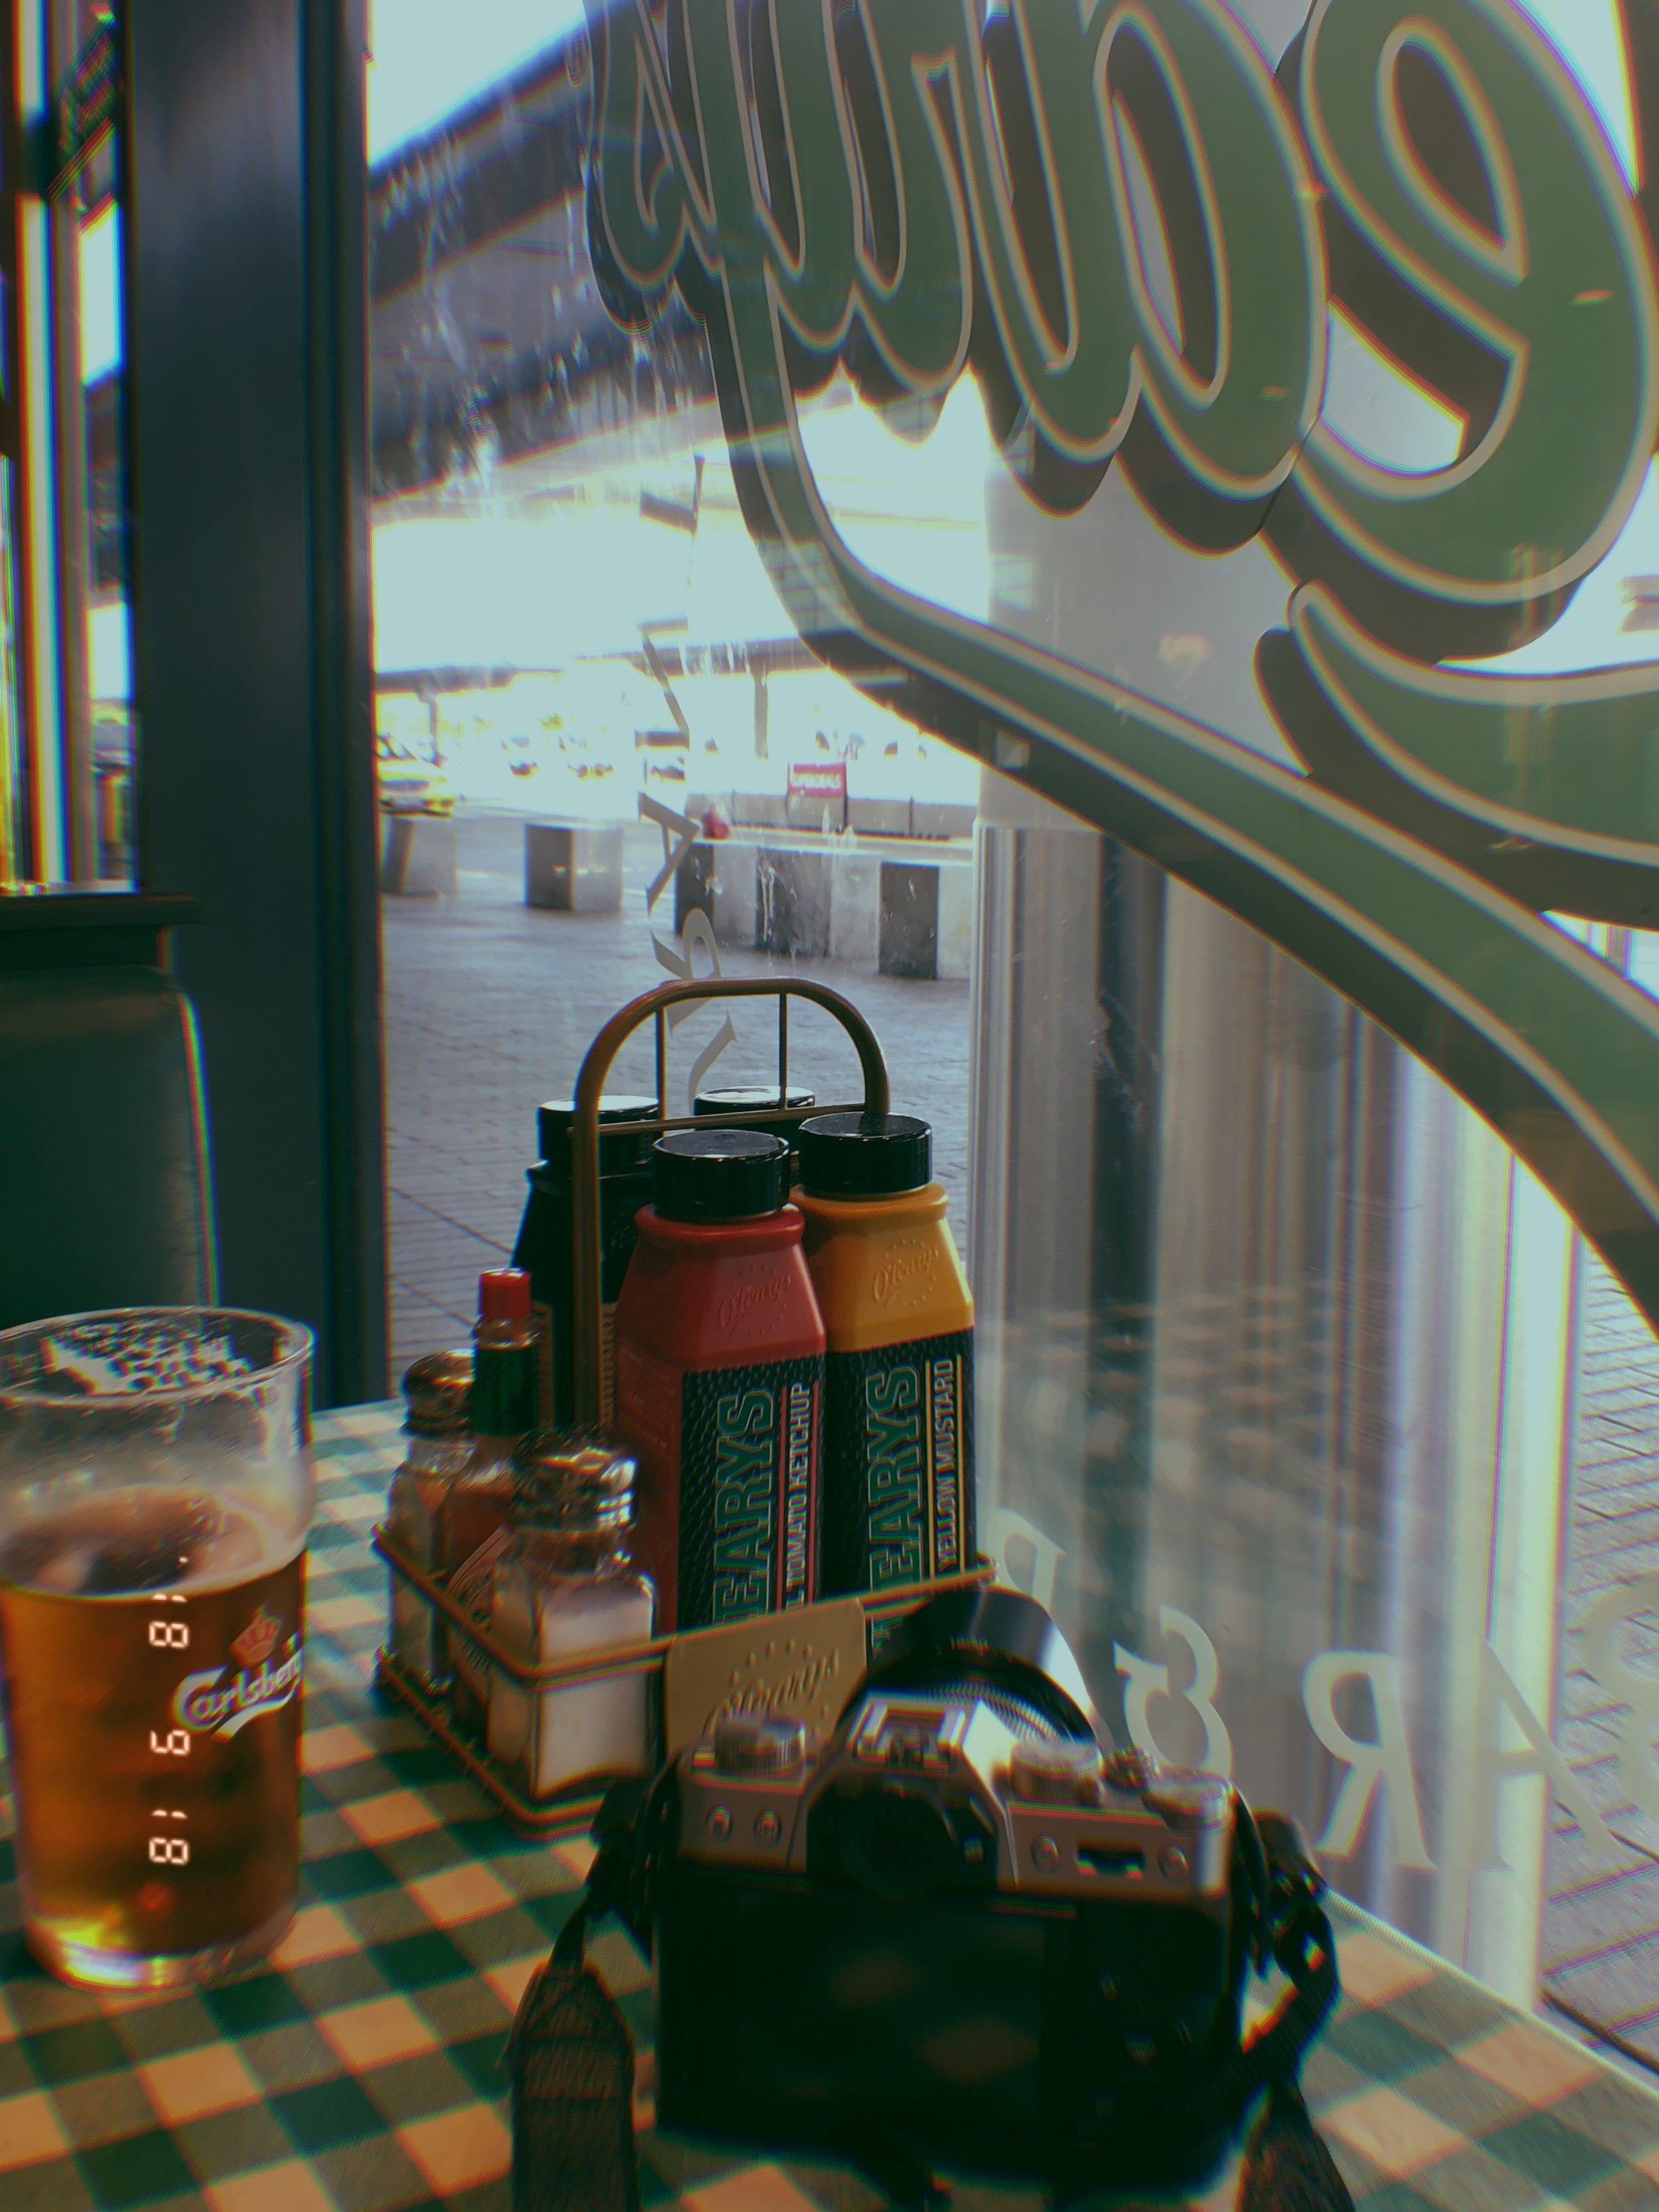 Photo 18-09-2018, 7 26 09 PM.jpg